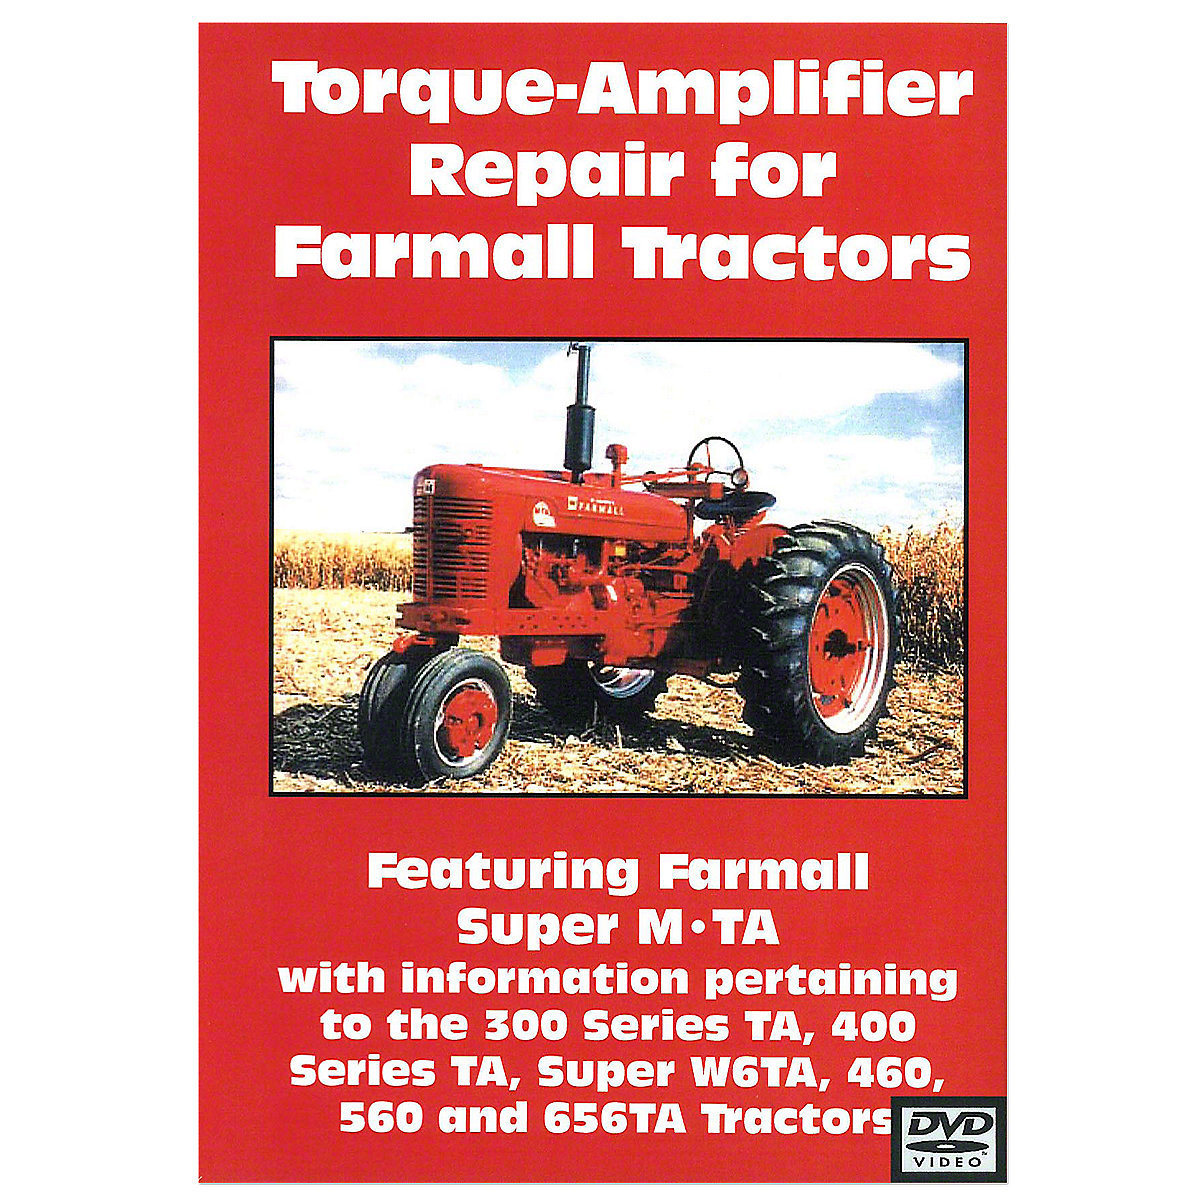 Farmall Torque-Amplifier Repair Video (Dvd)